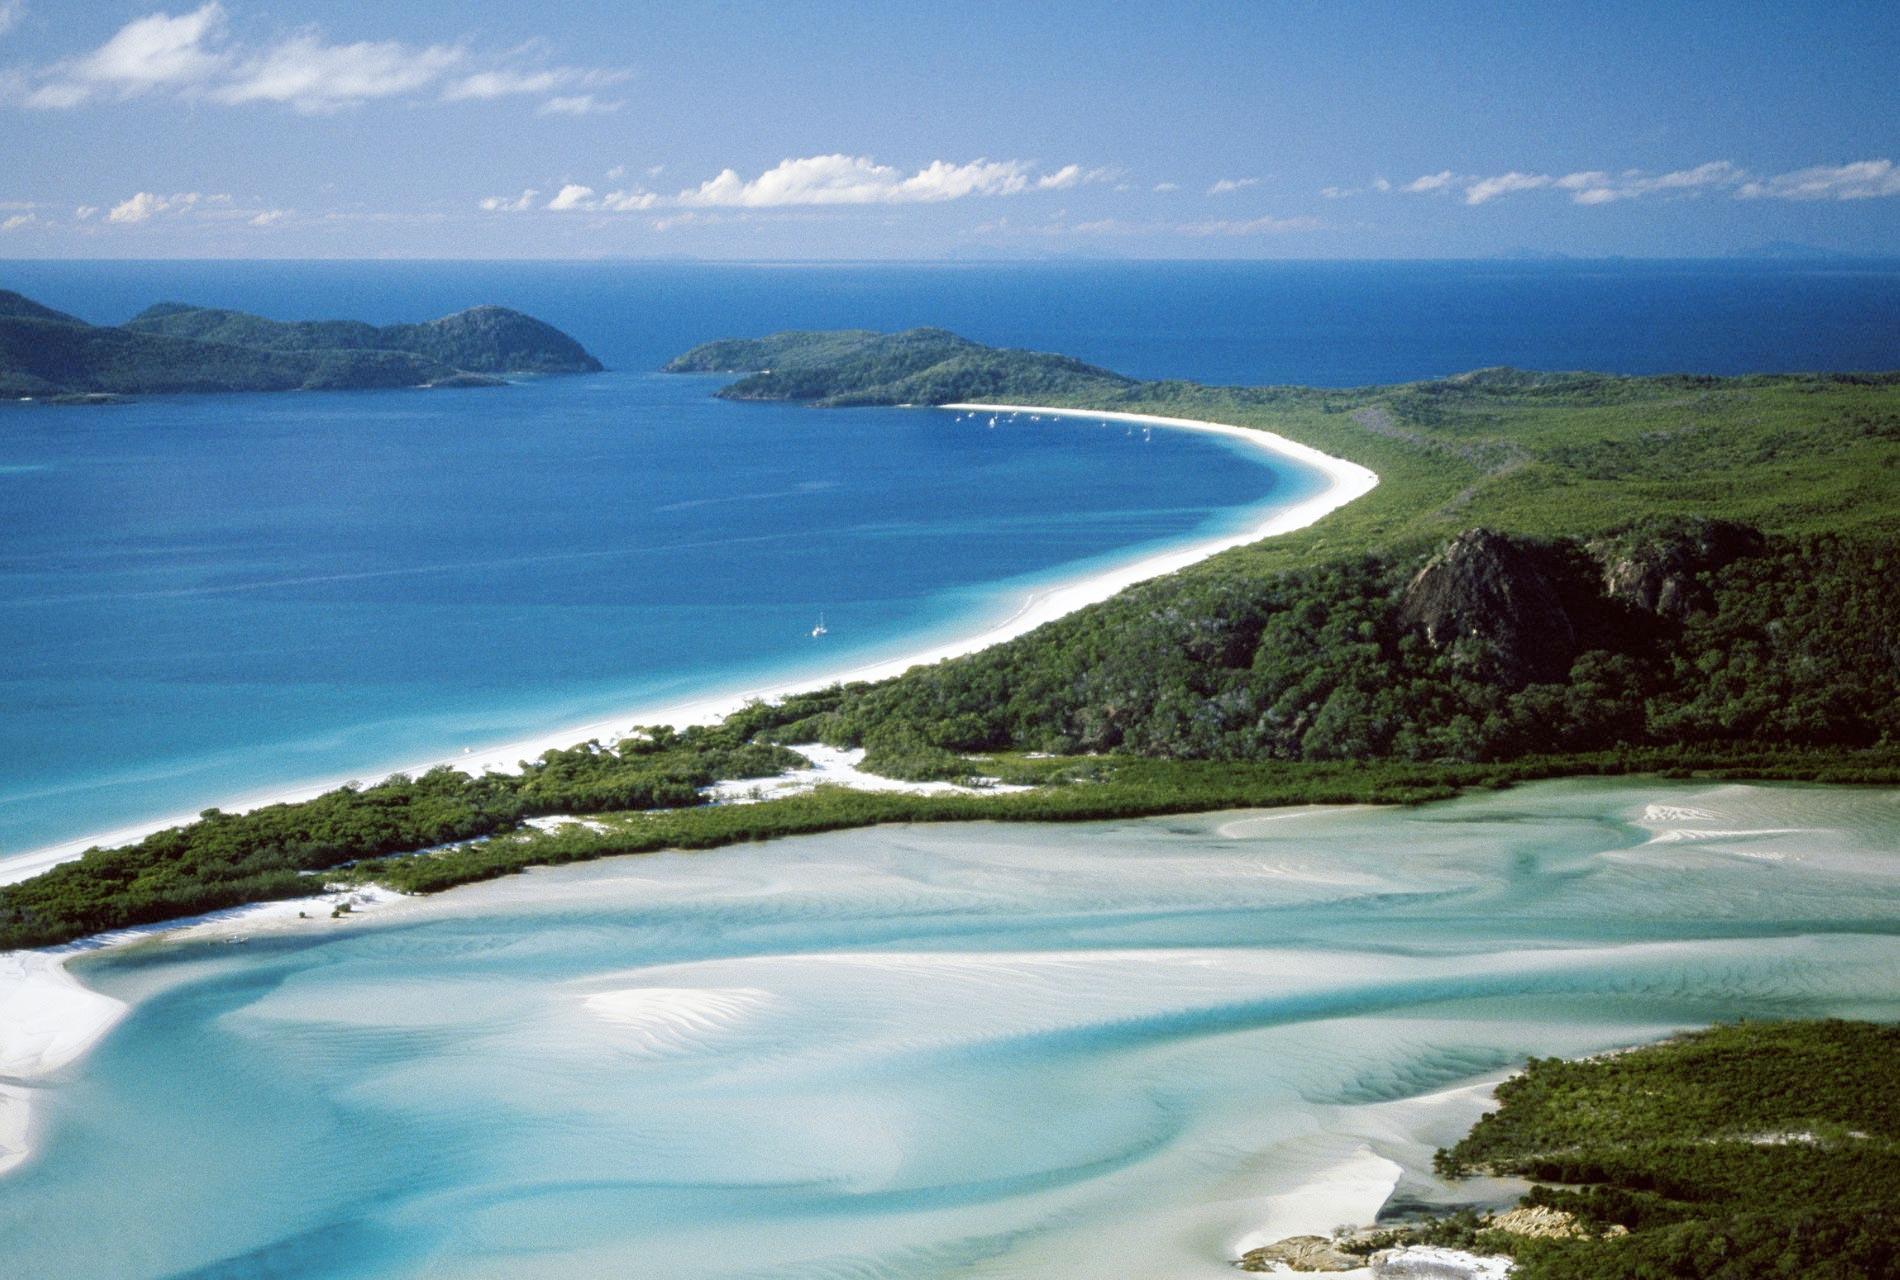 Destinazioni Crociere Oceano Pacifico